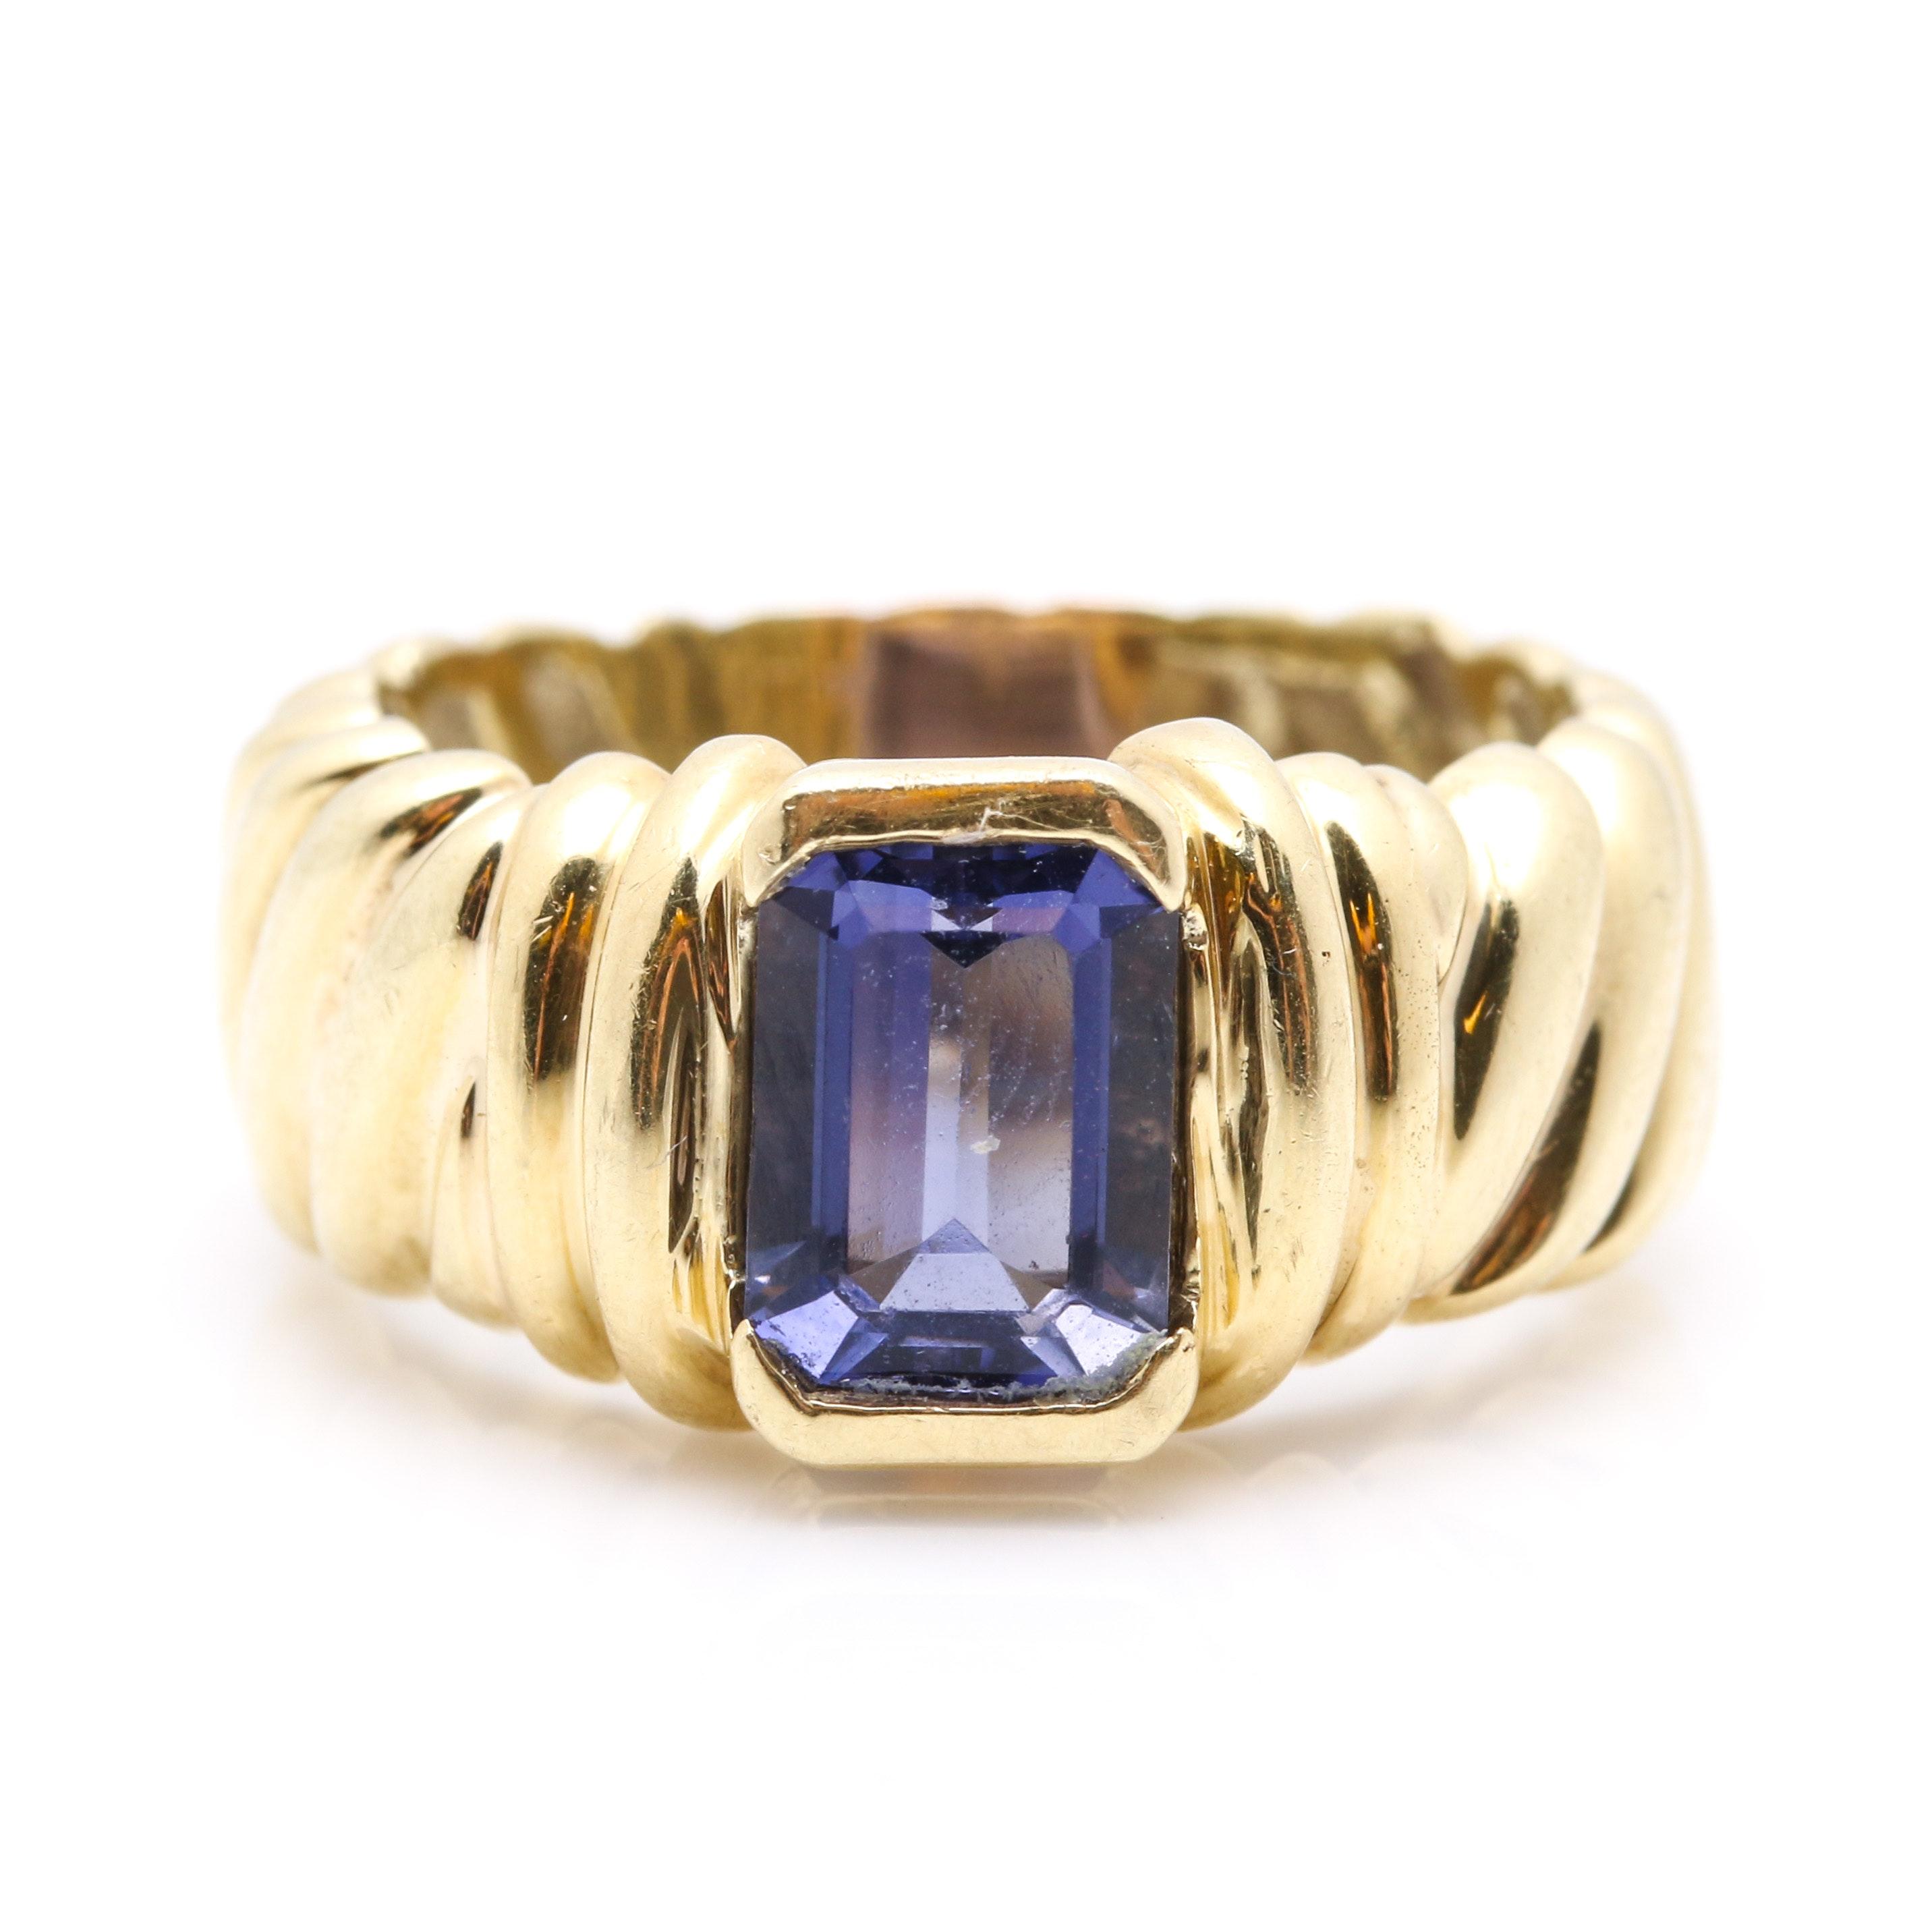 David Yurman 1.28 CT Iolite Cable Ring